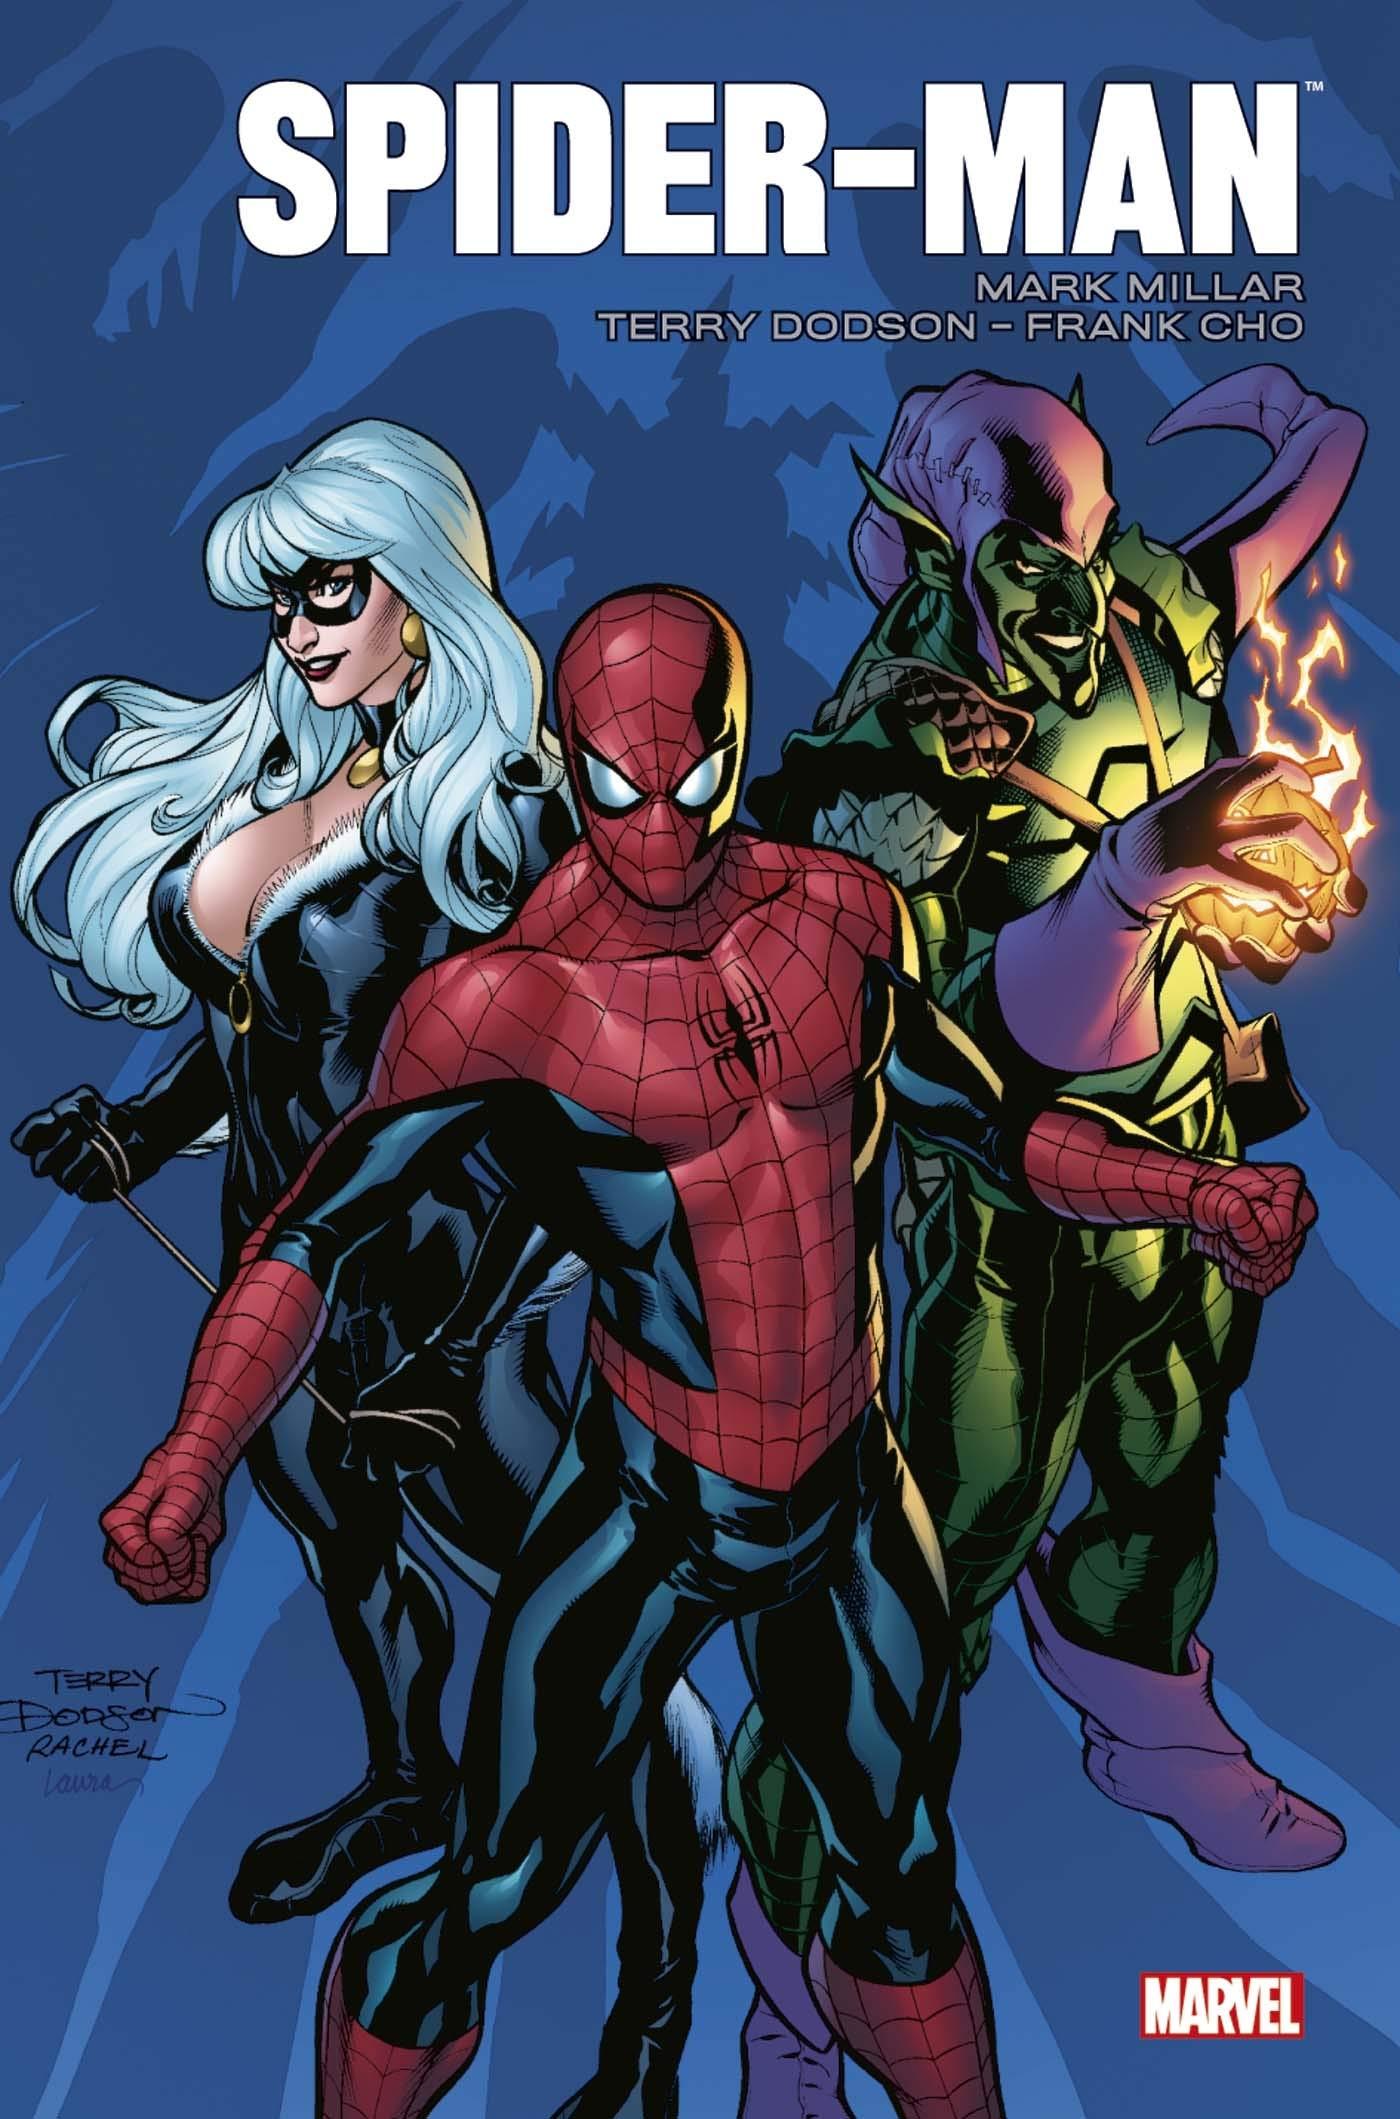 Spider-Man par Millar et Dodson 1 - Spider-Man par Millar et Dodson